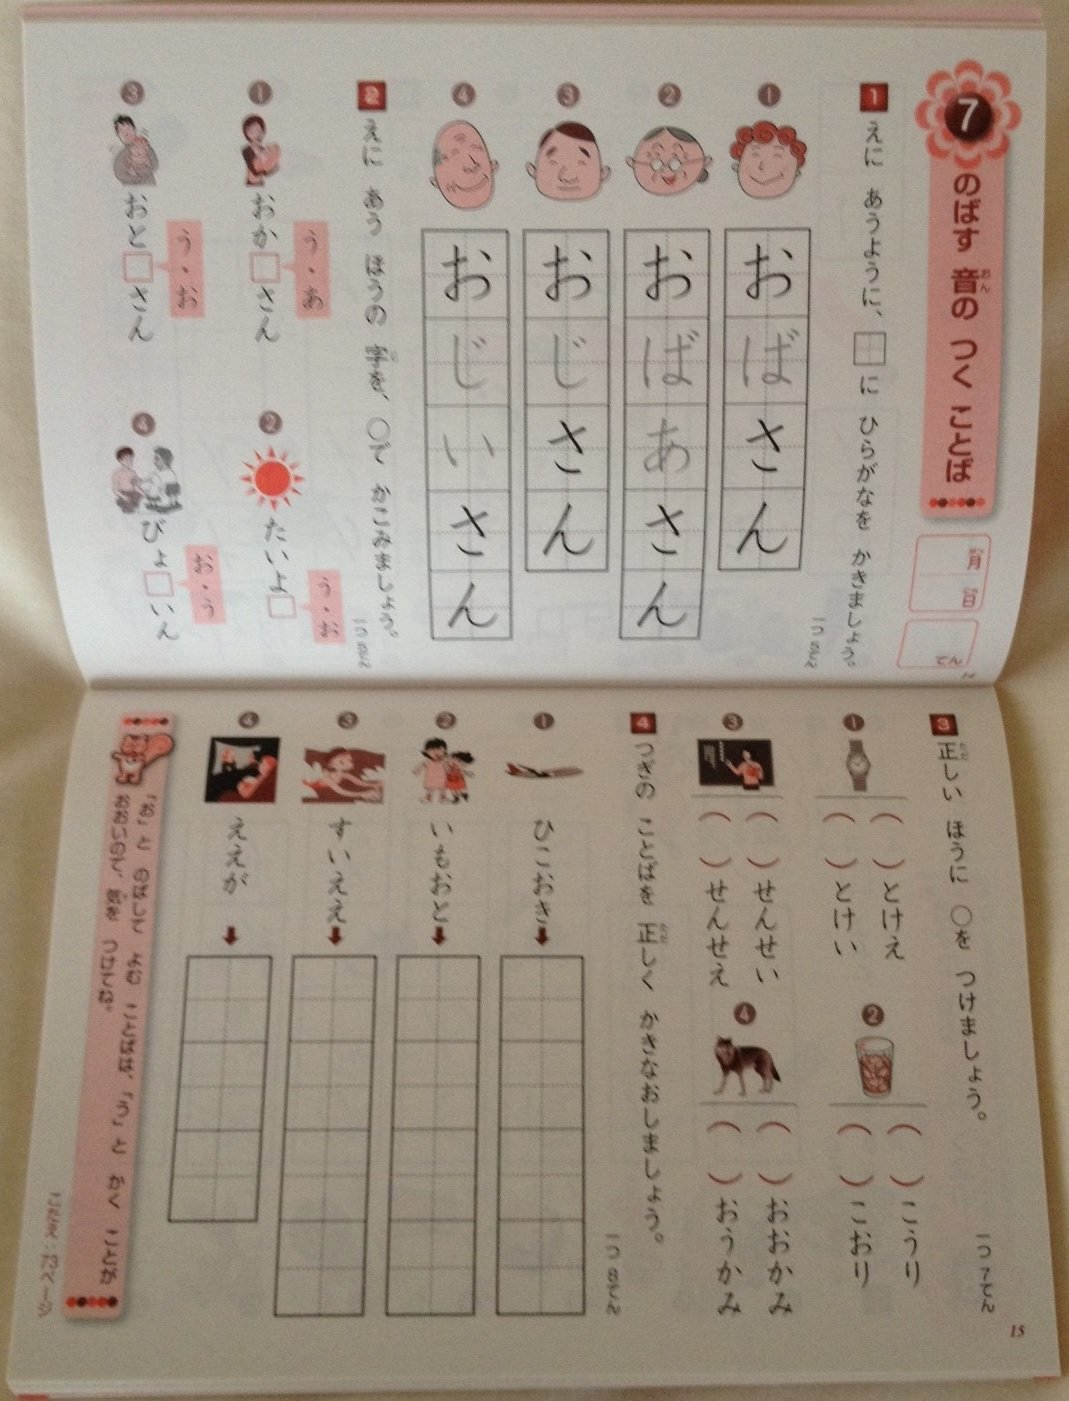 /& Sentence Japanese Words kotoba Work Book to 1th Grade 80 Pages Daiso bunsho